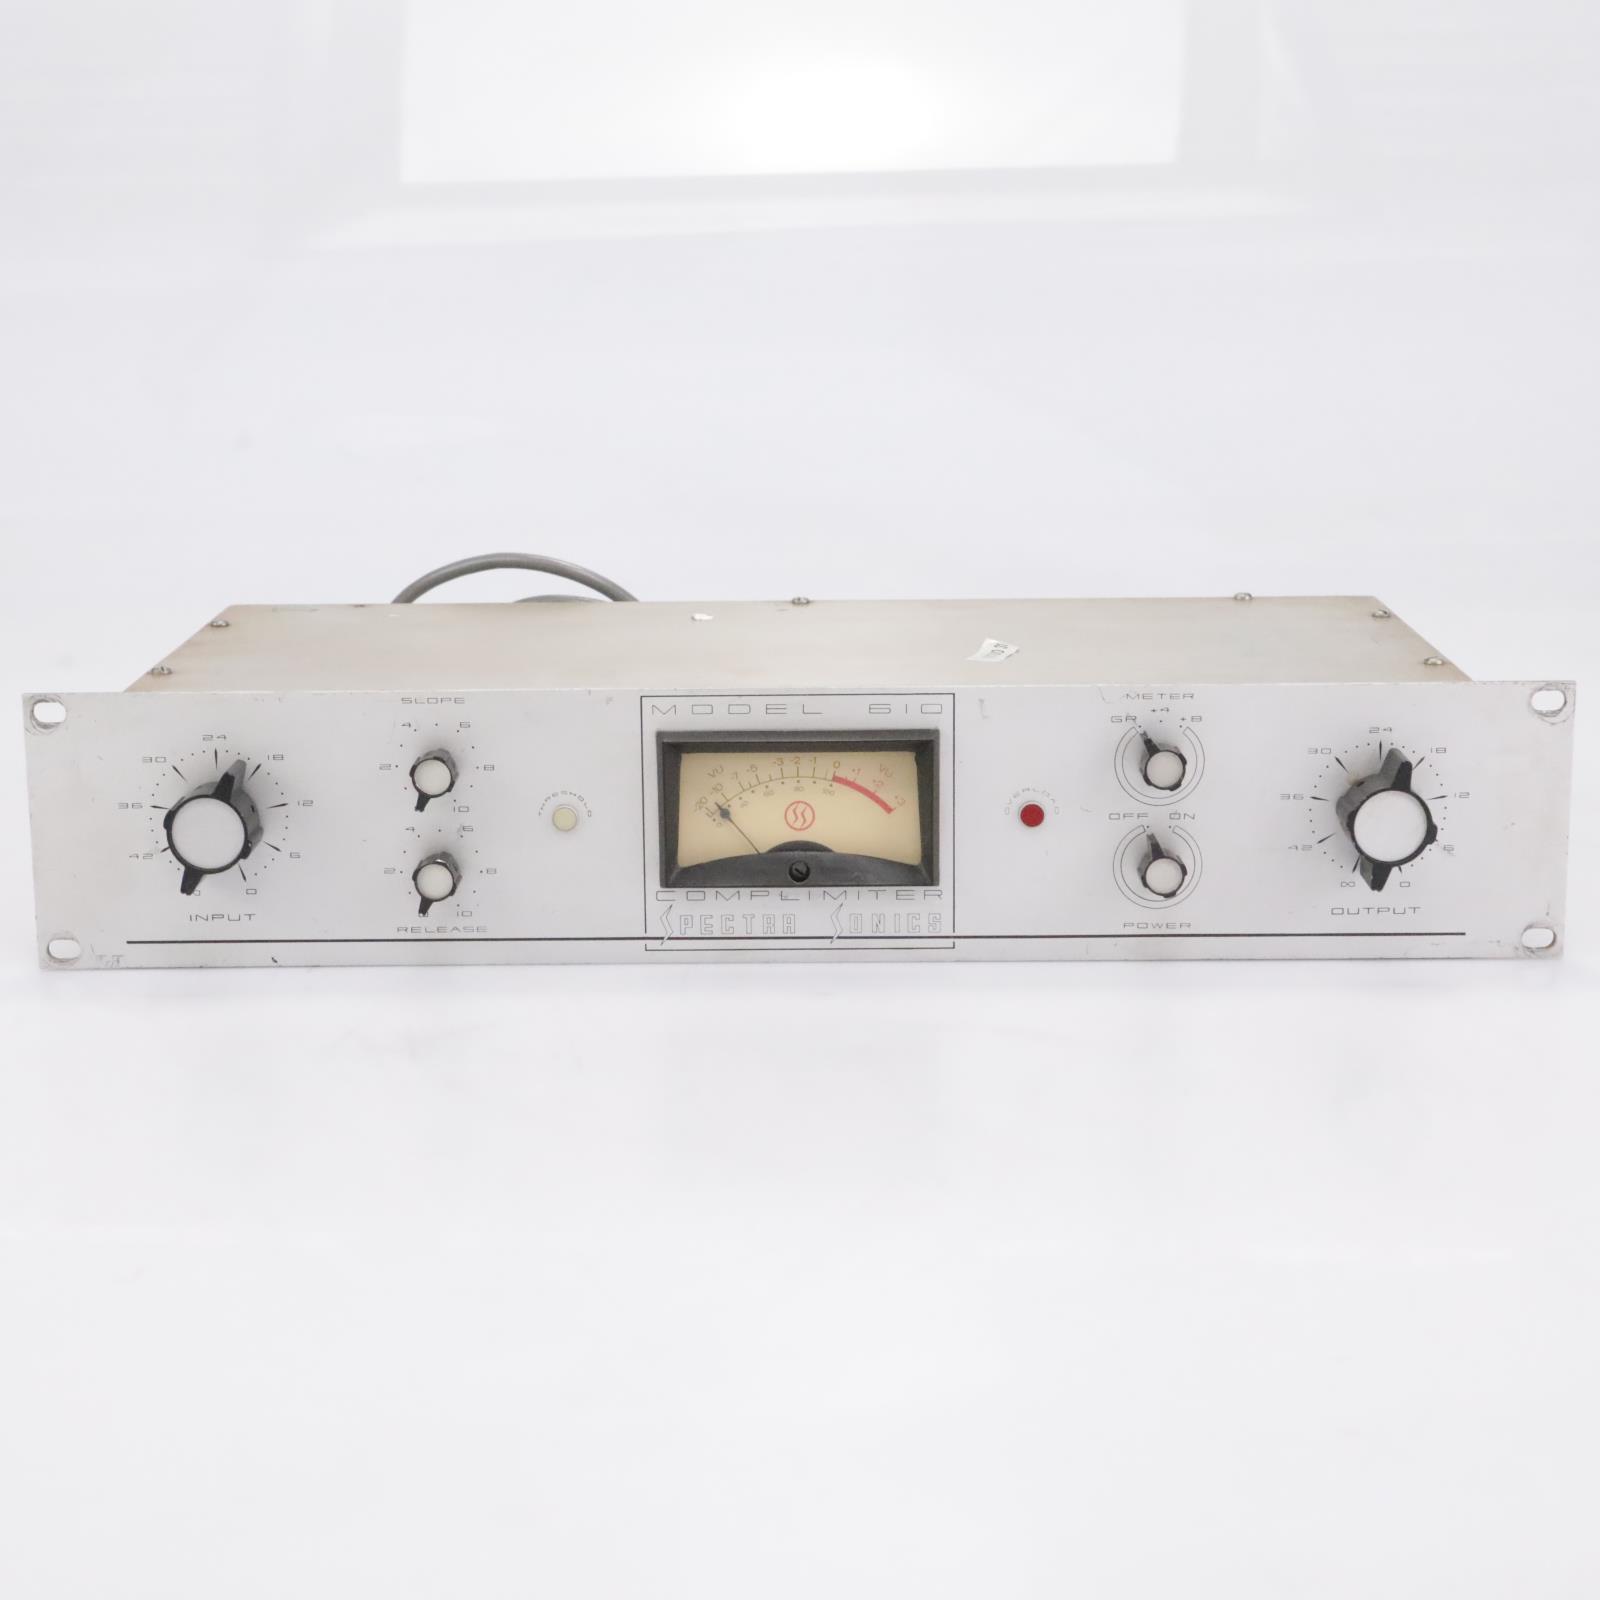 Spectra Sonics Model 610 Complimiter (Compressor / Limiter) #43554